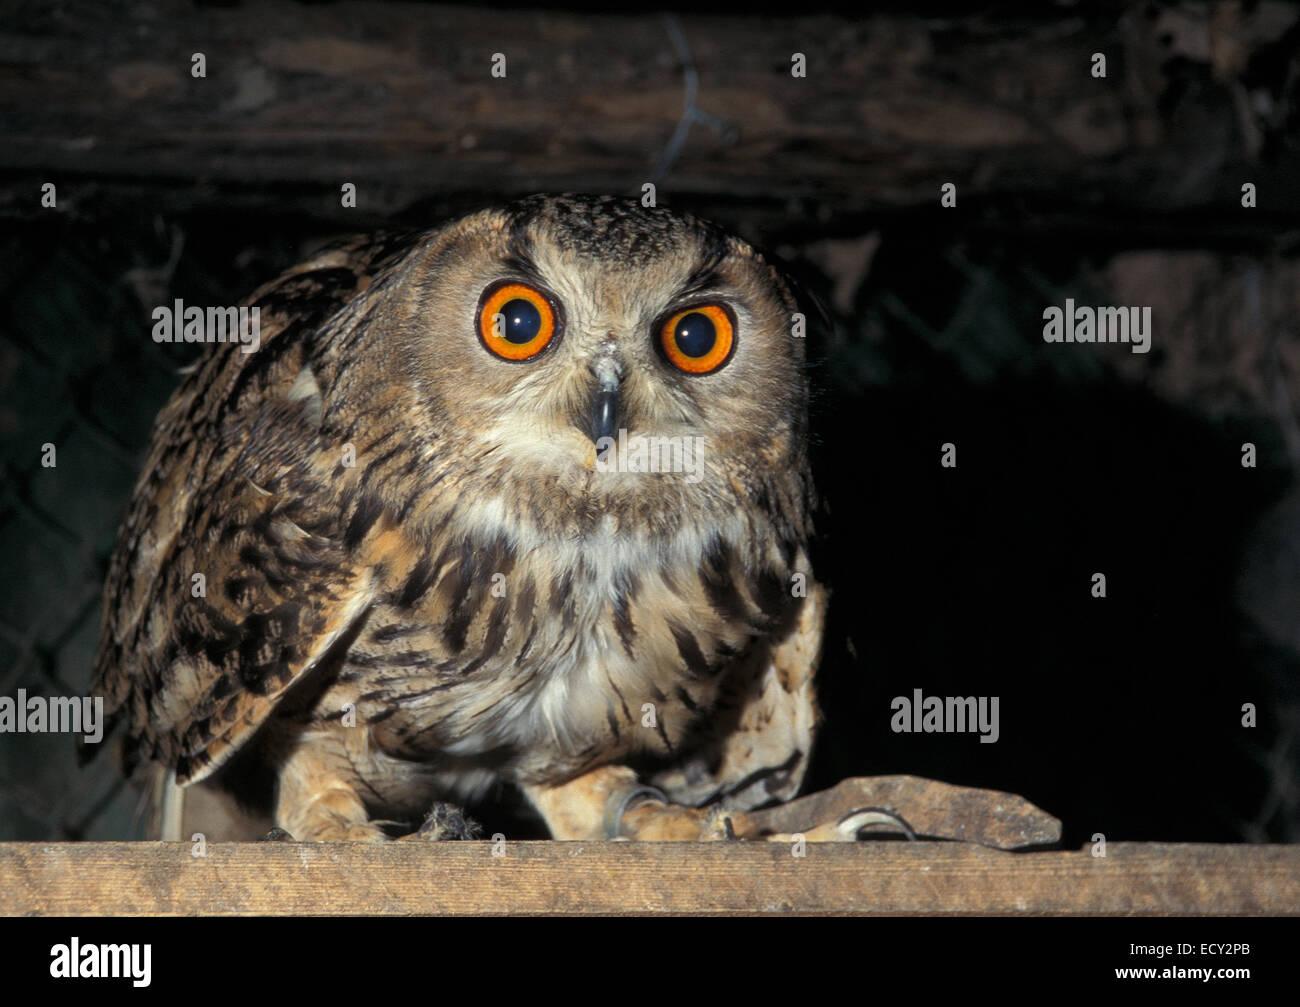 Indian eagle-owl, Bubo bengalensis, Strigidae - Stock Image